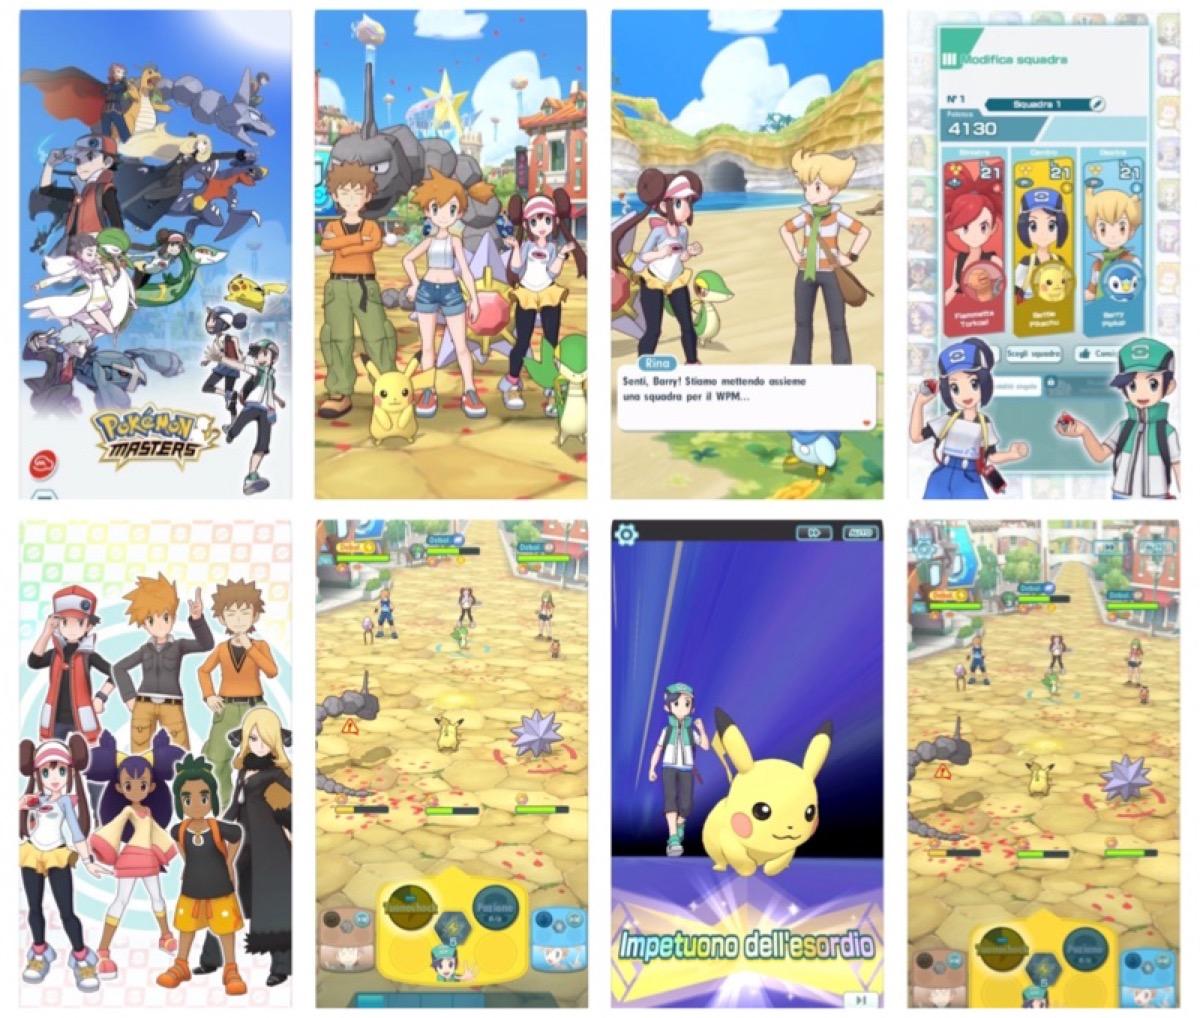 E' arrivato Pokémon Masters per iPhone, iPad e Android